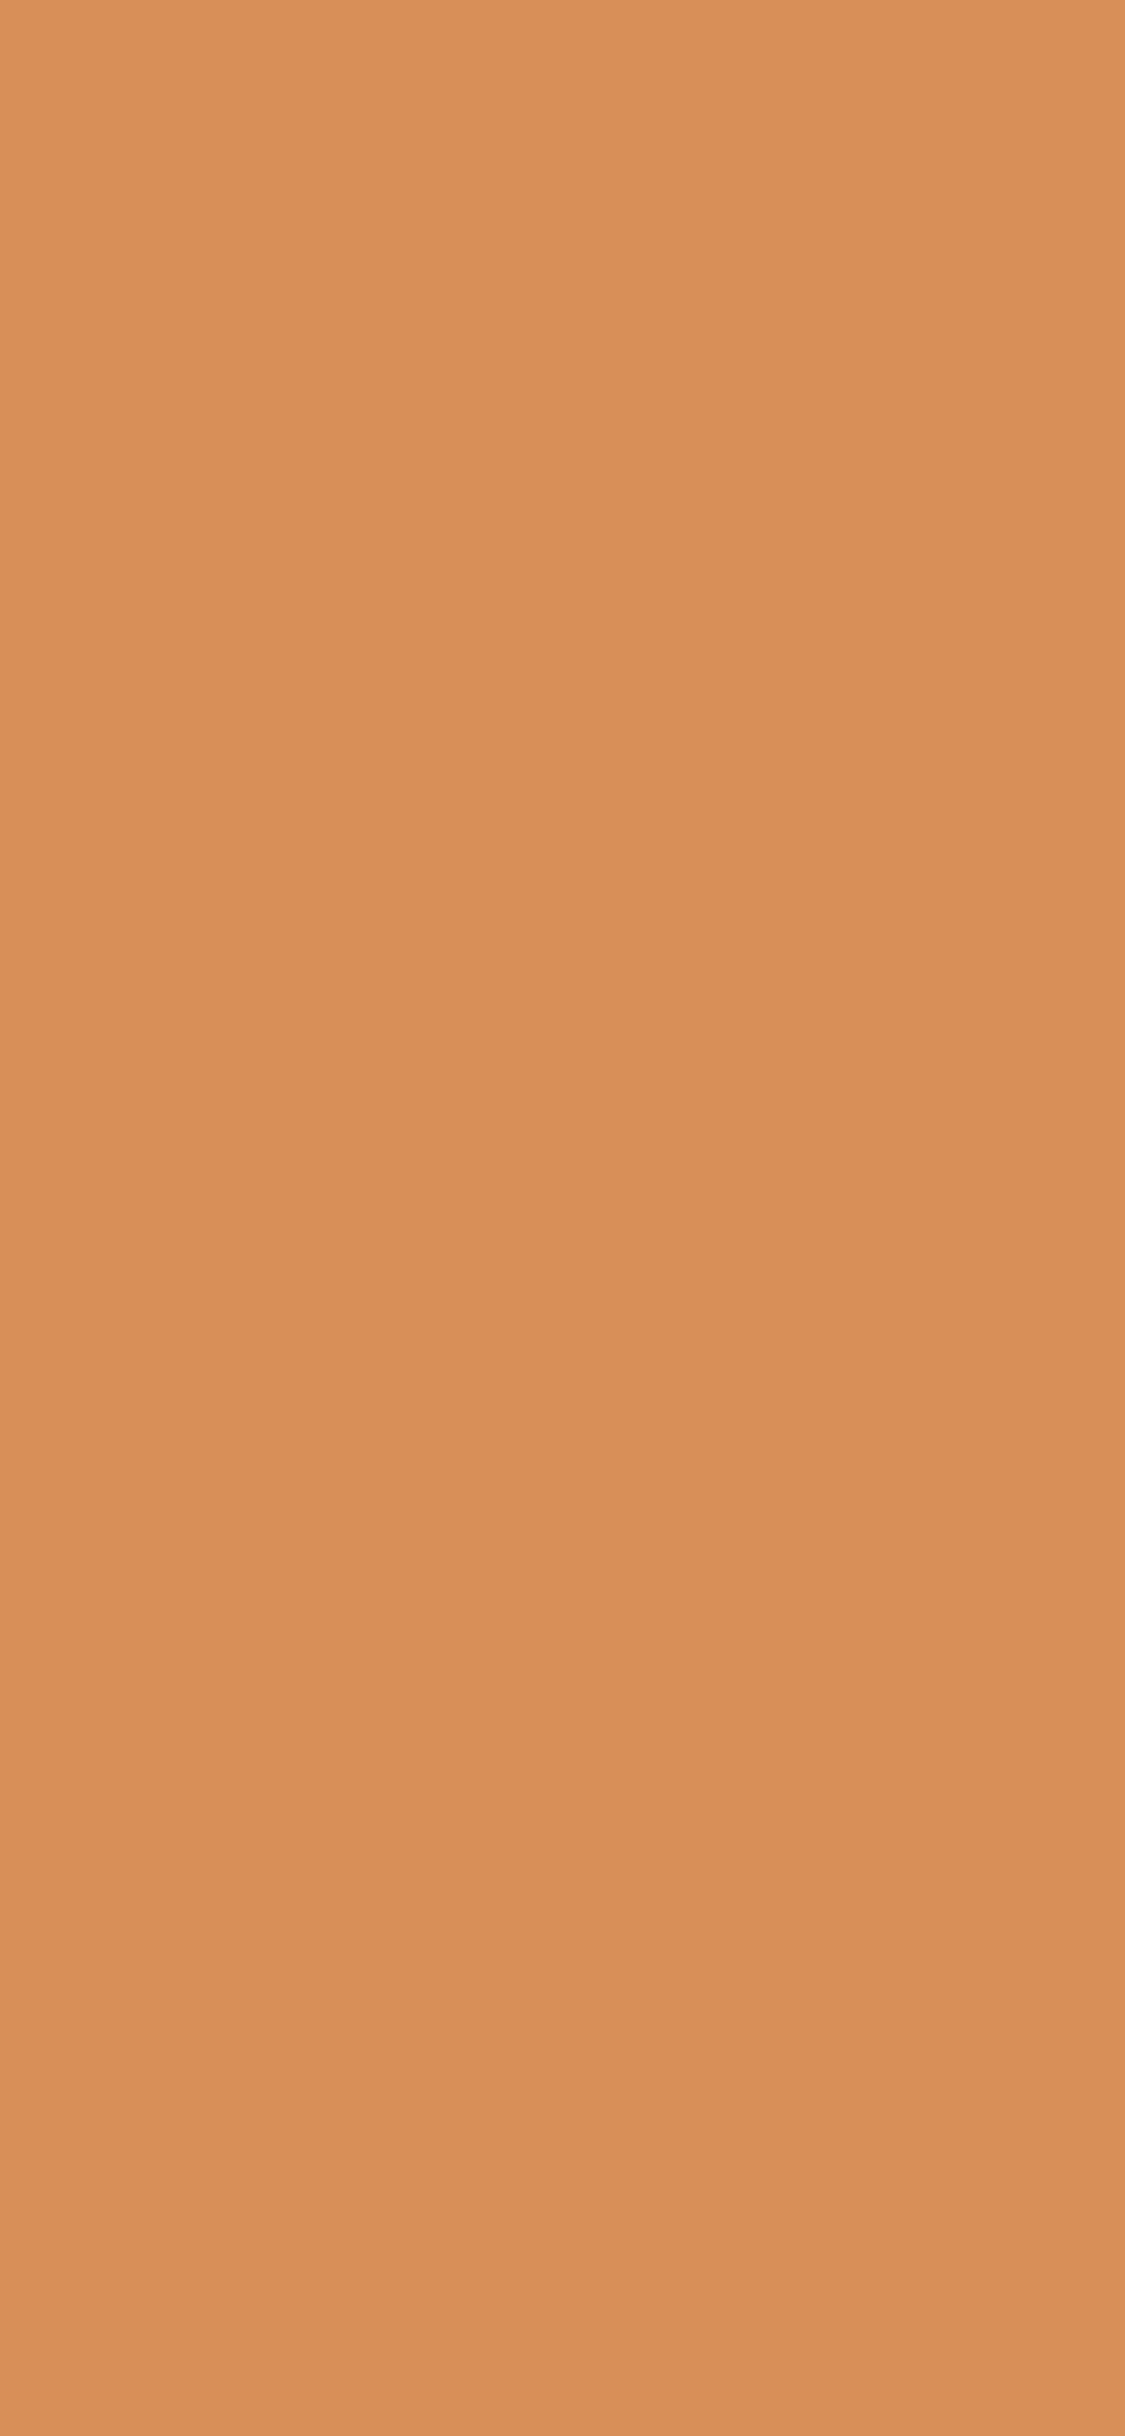 1125x2436 Persian Orange Solid Color Background